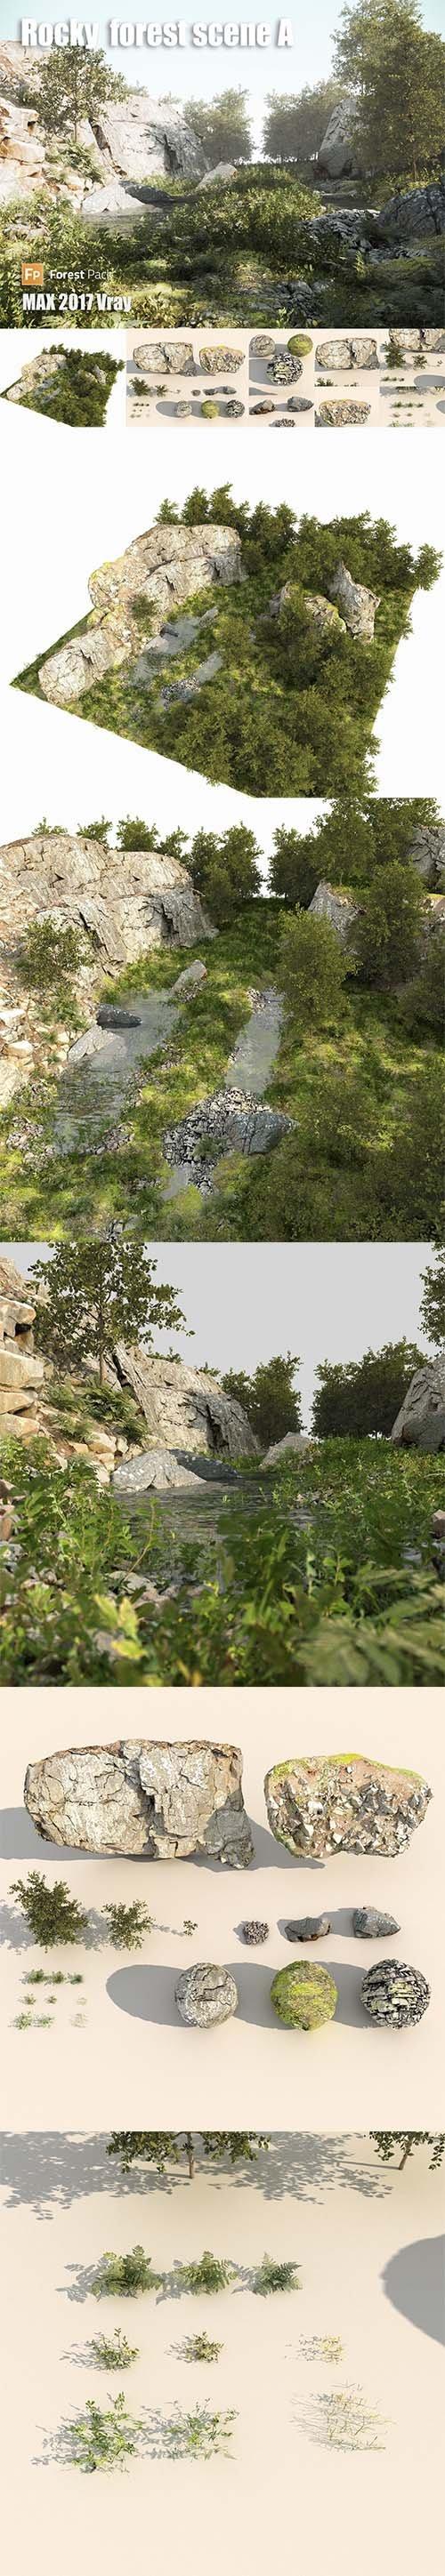 Rocky forest scene A 3D model